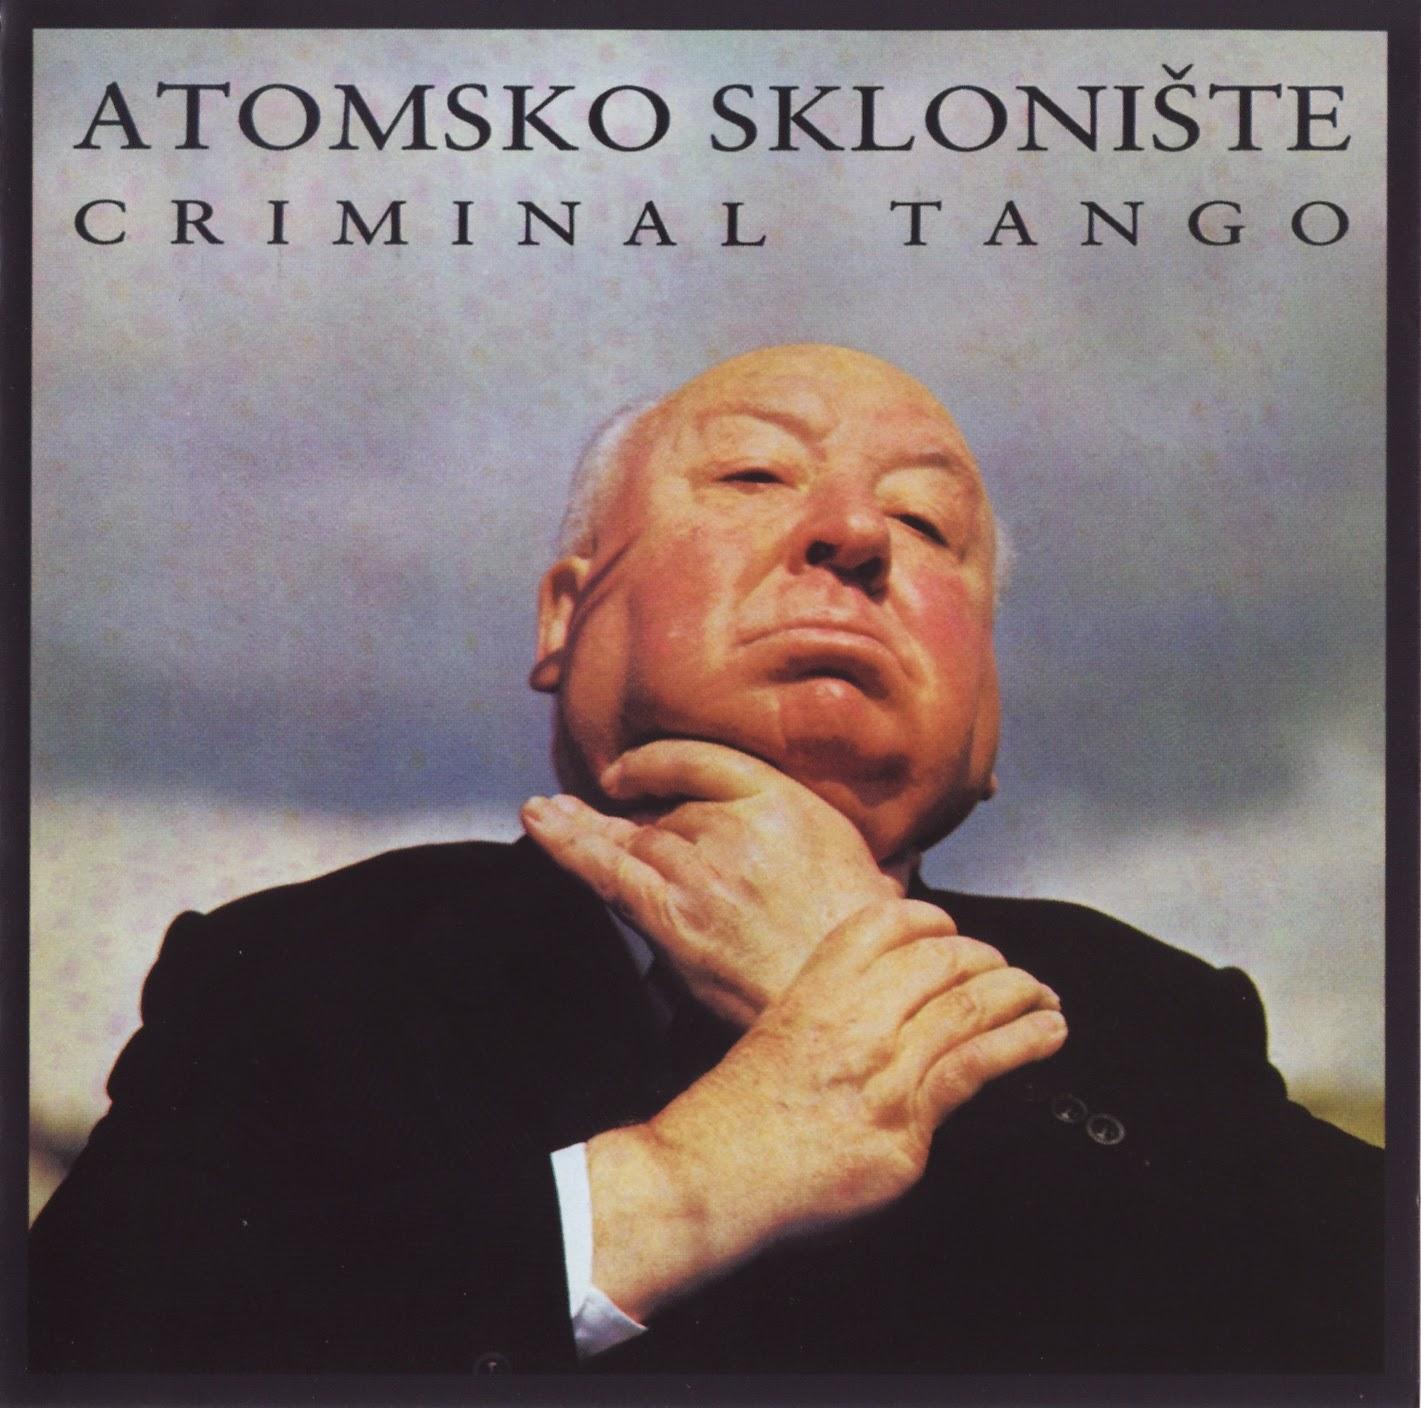 Atomsko Skloniste - Diskografija (1978-1995)  Atomsko+skloniste+-+Criminal+tango+f